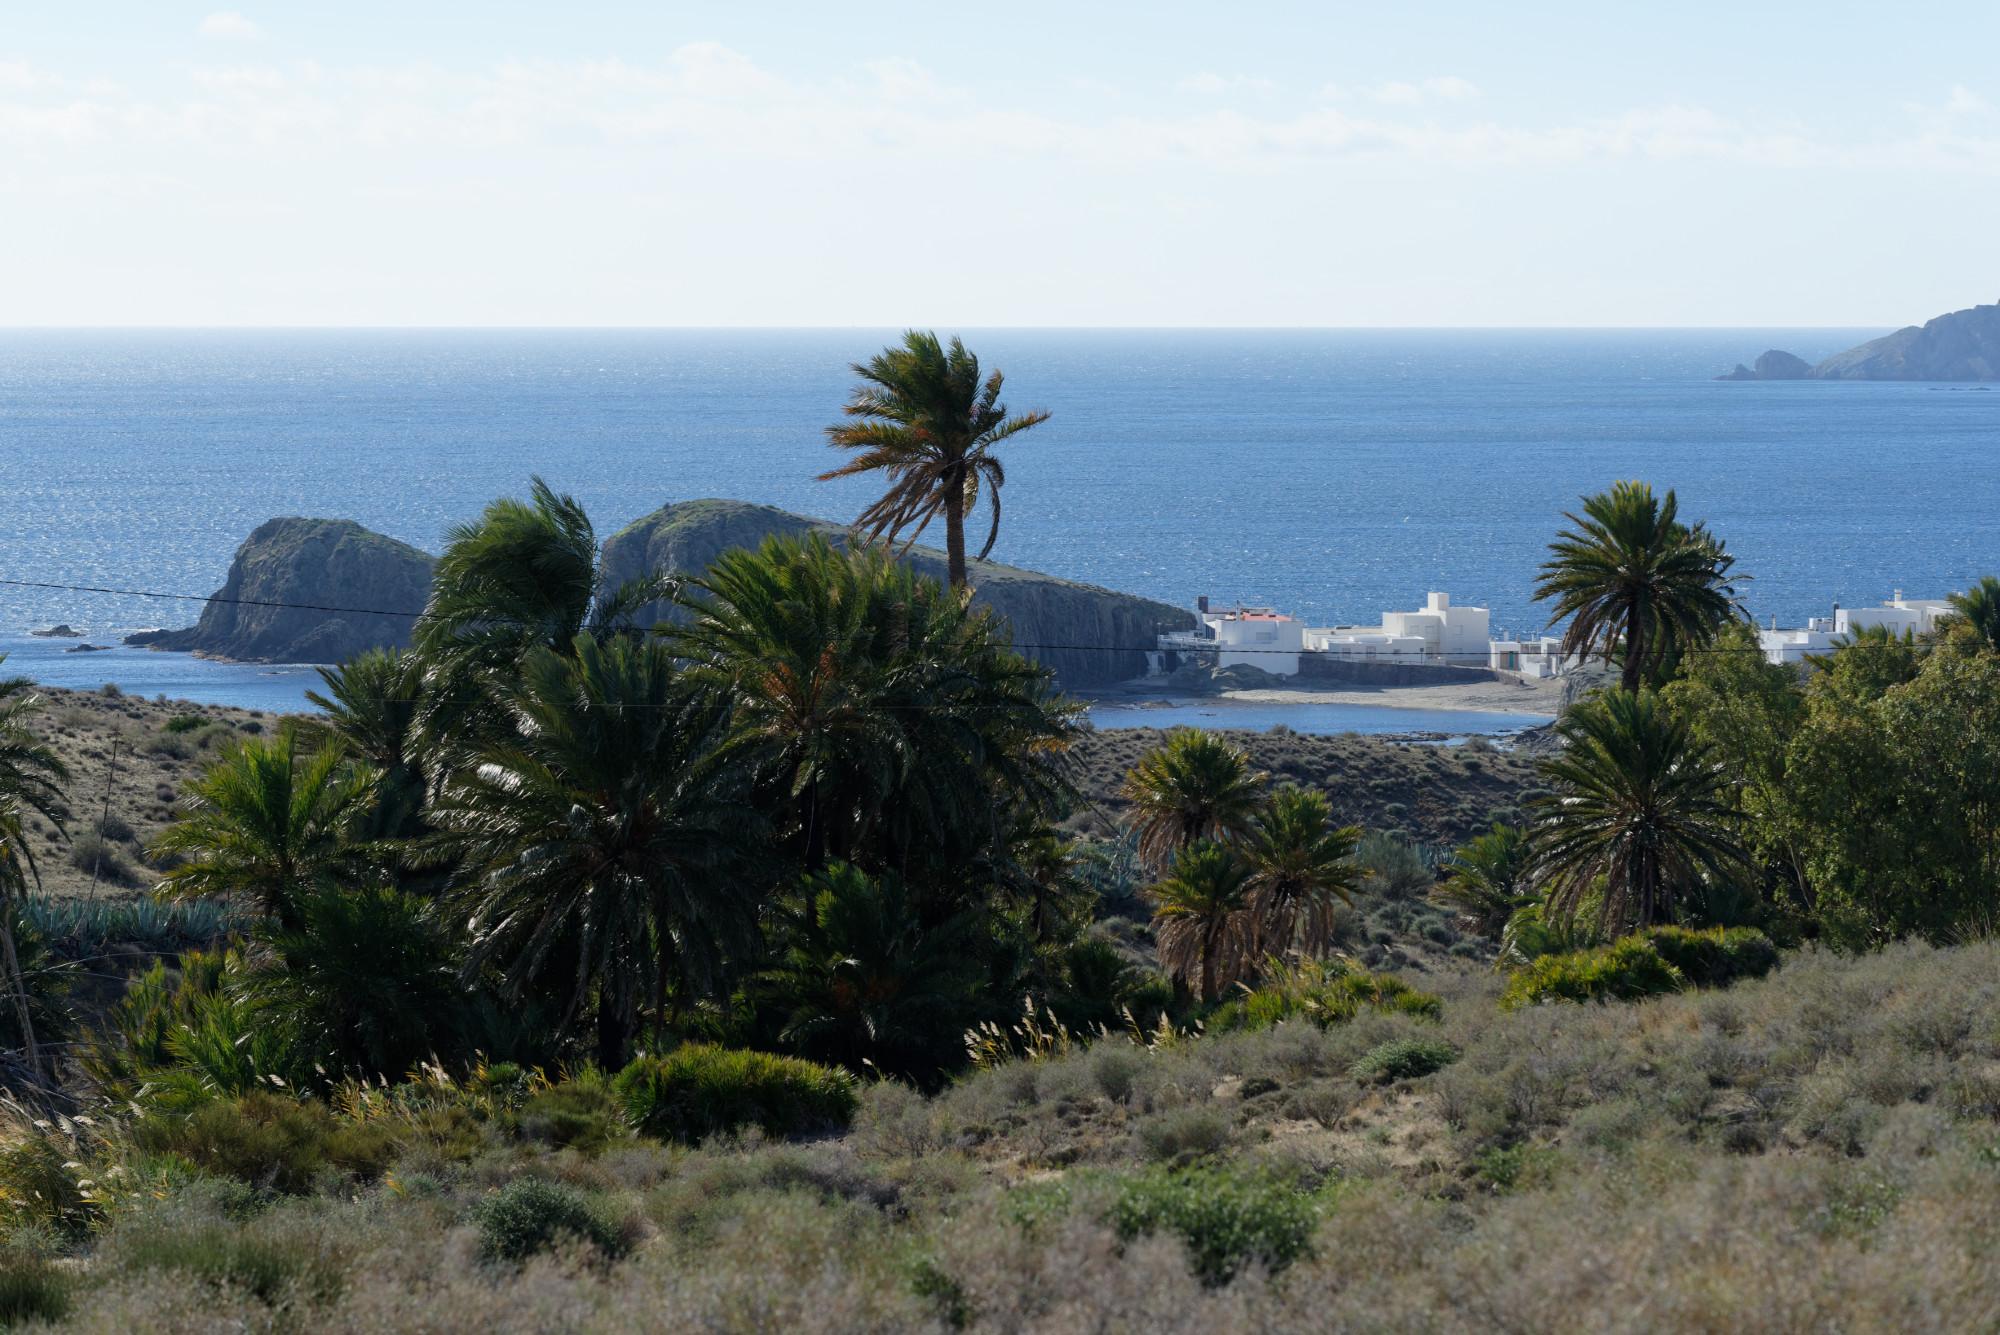 171214-Isleta del Moro (Cabo de Gata-Andalousie) (1)